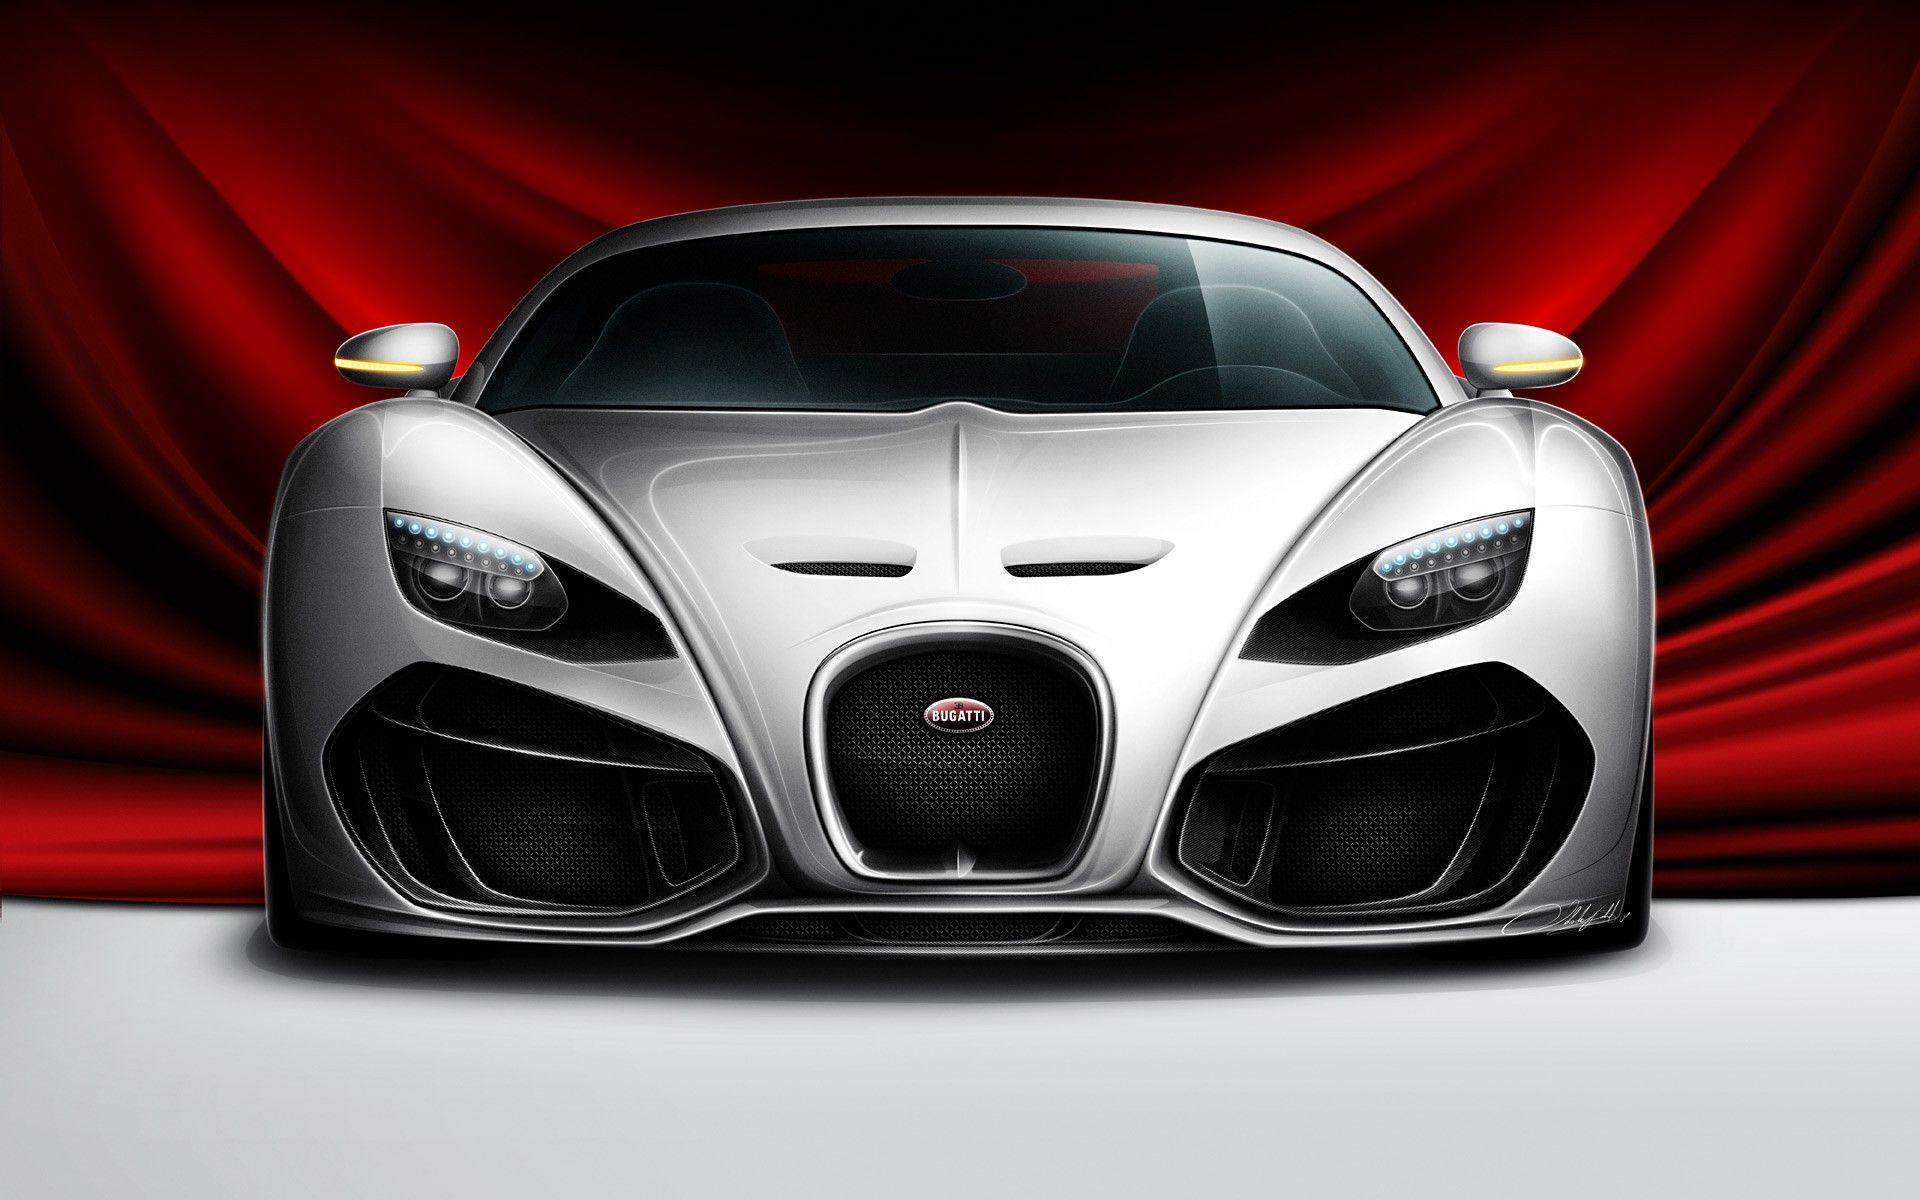 74b32c14aae368766a42e4afeb0eb7d7 Wonderful Bugatti Veyron Real Racing 3 Price Cars Trend